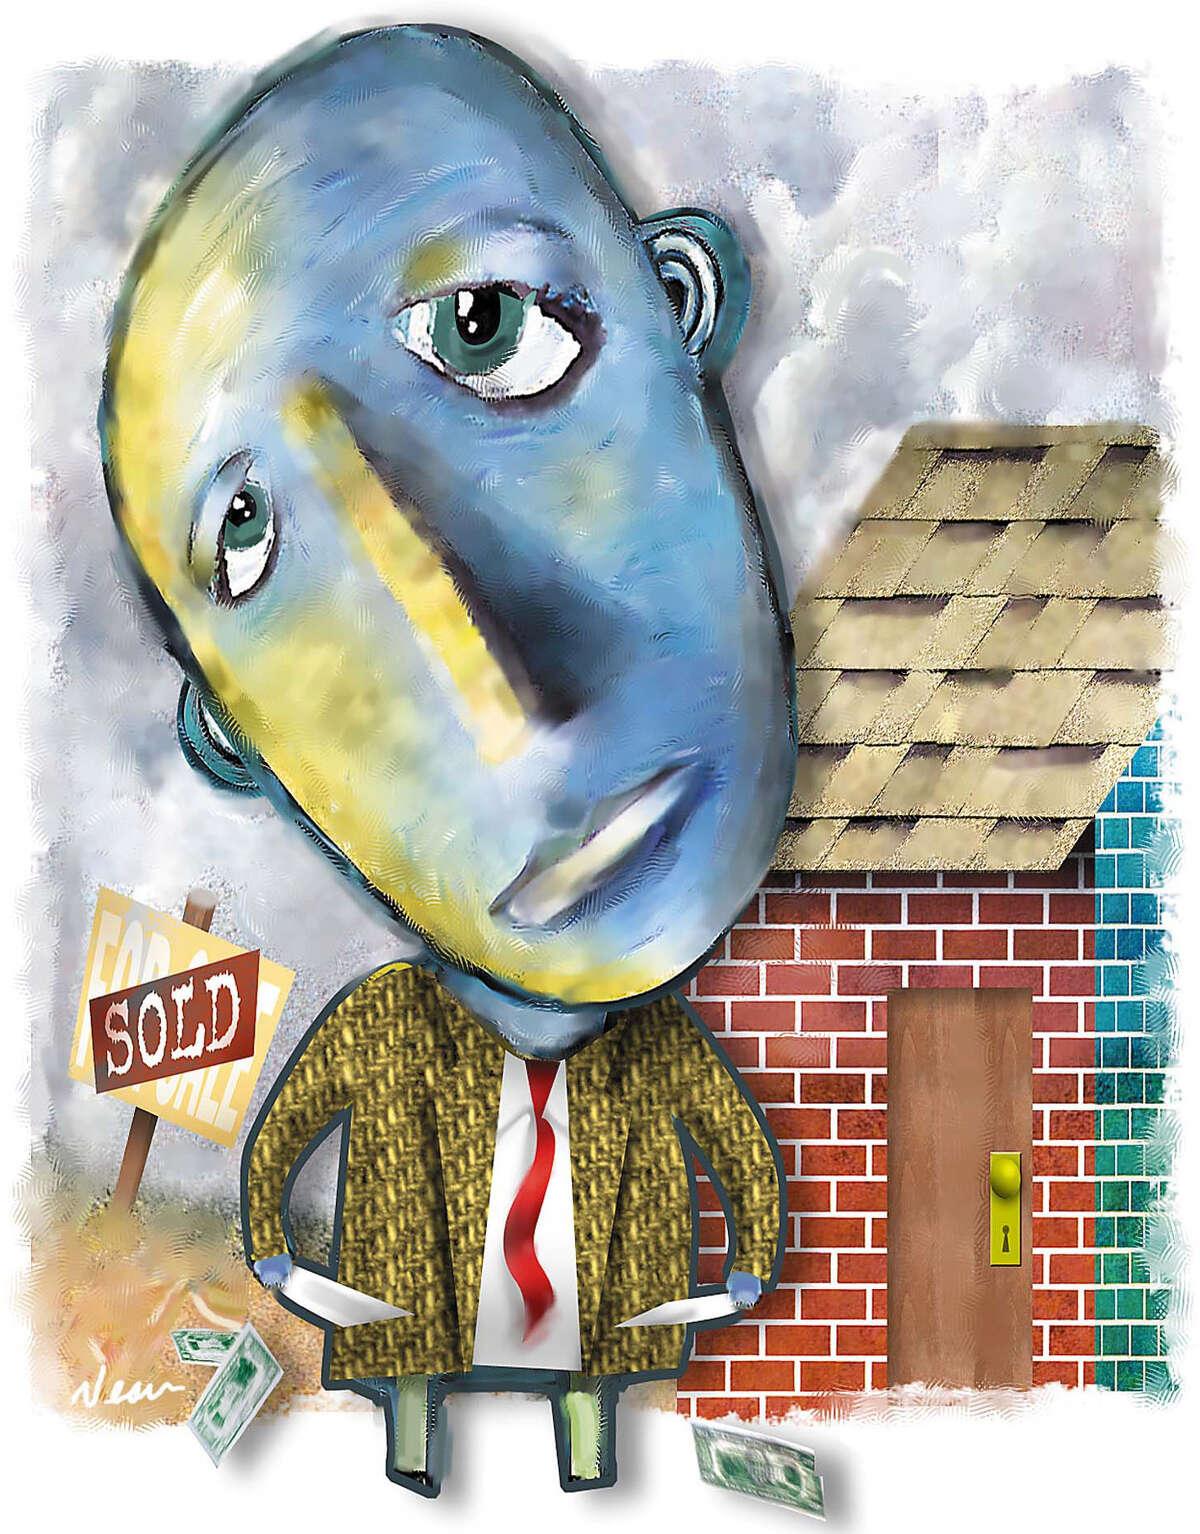 Rick Nease color illustration. Detroit Free Press